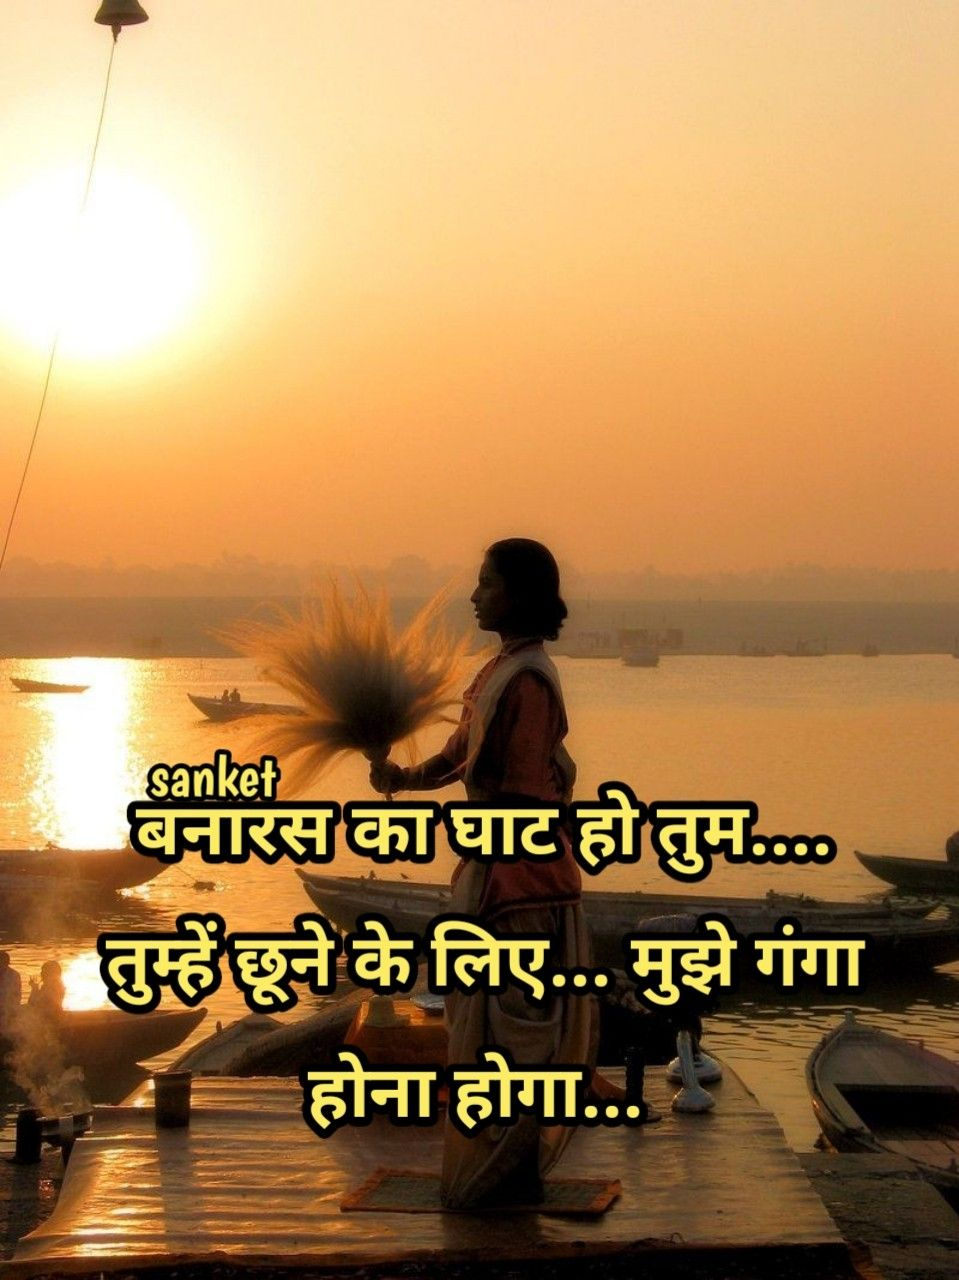 Pin By Sanket On Shayri Sanket Hindi Quotes Quotes Marathi Quotes